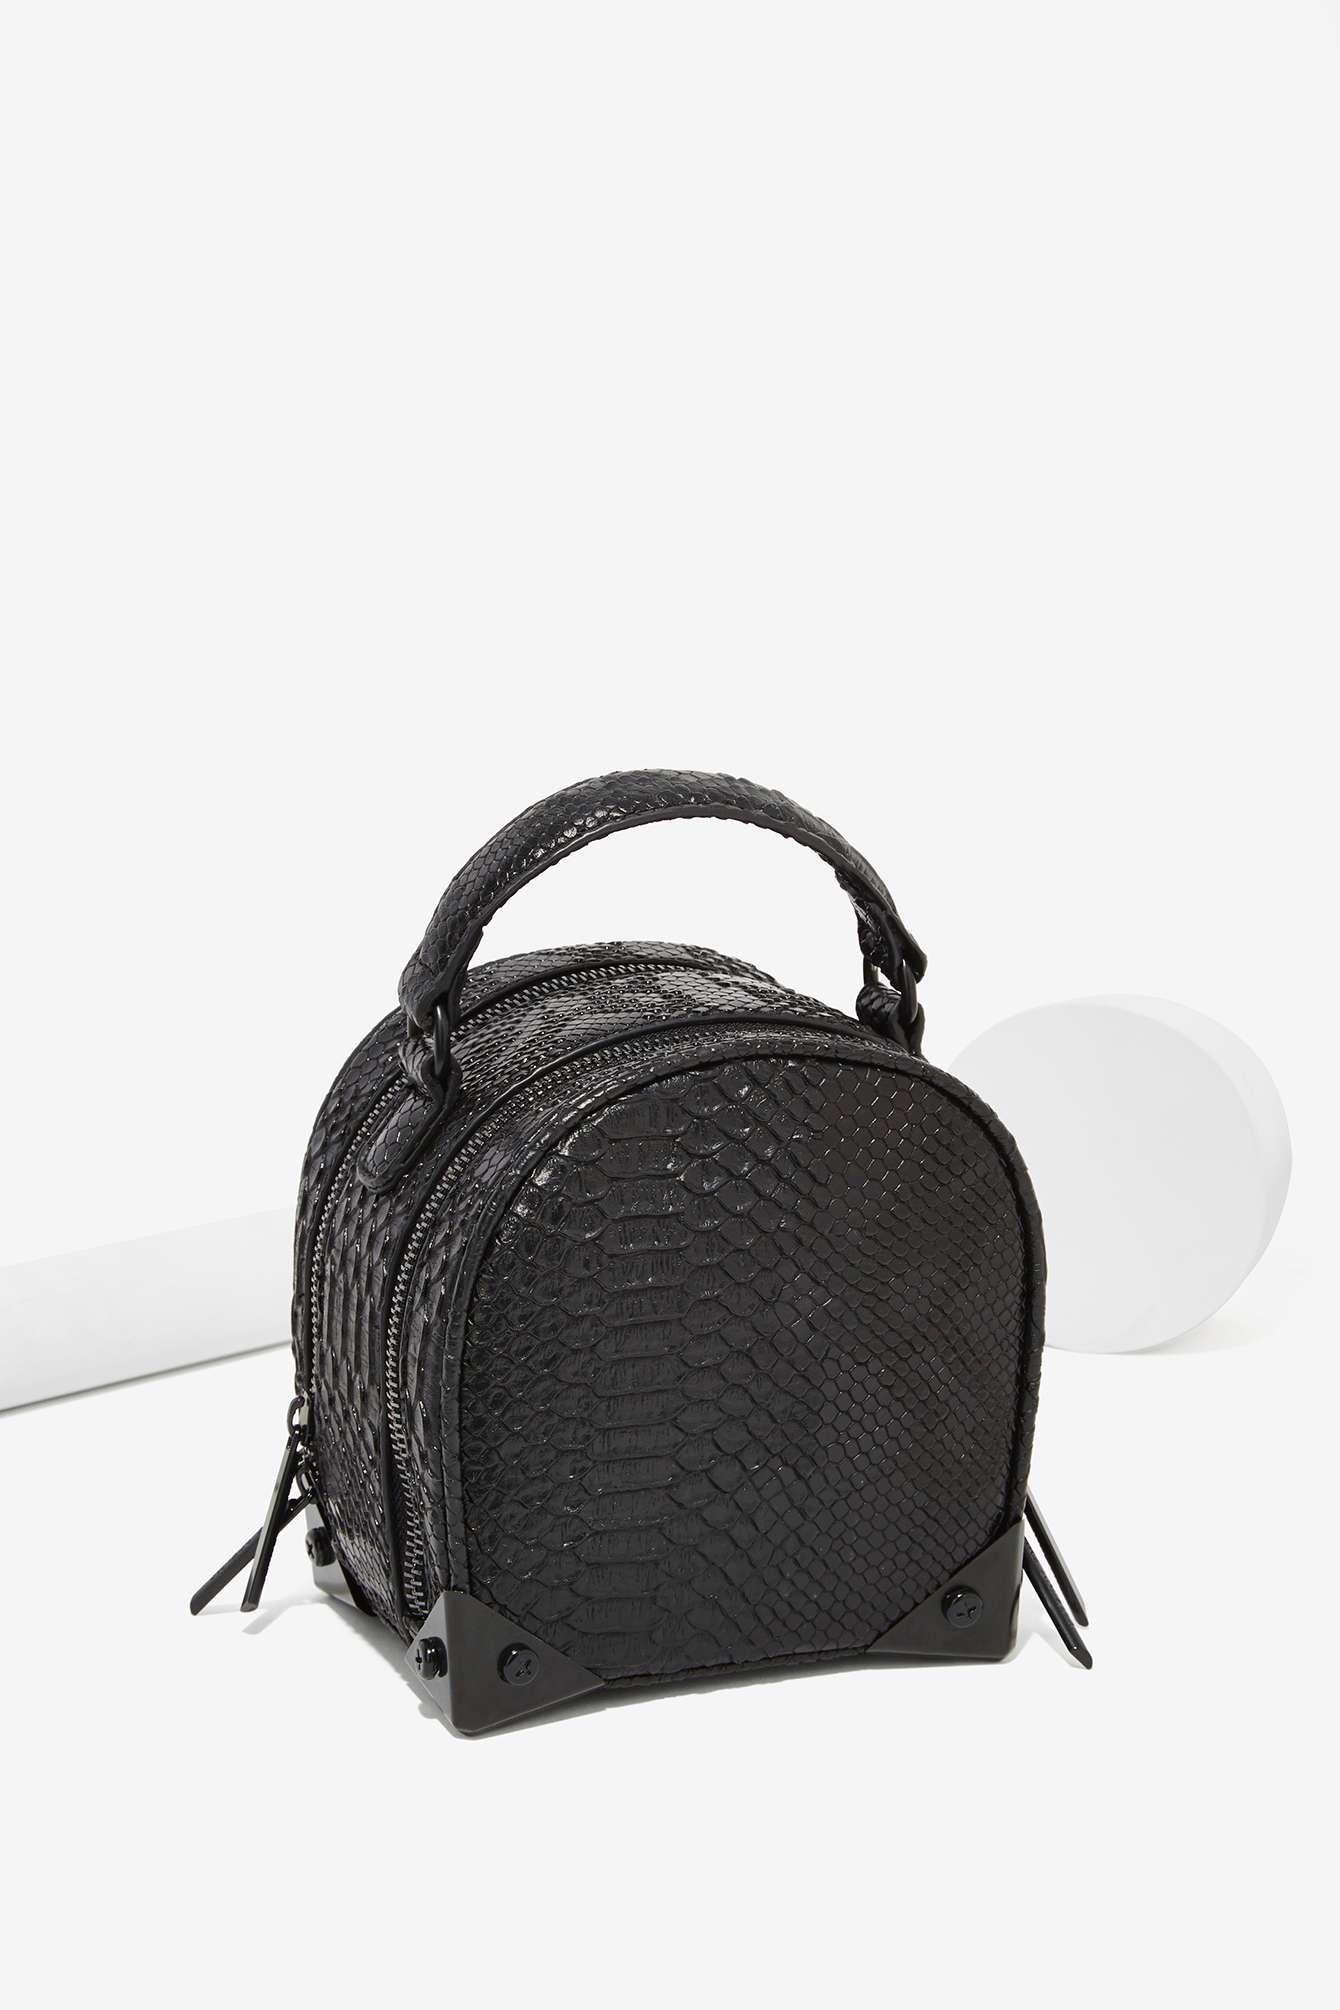 f4da972c50 Croc Stalker Vegan Leather Crossbody Bag Monederos